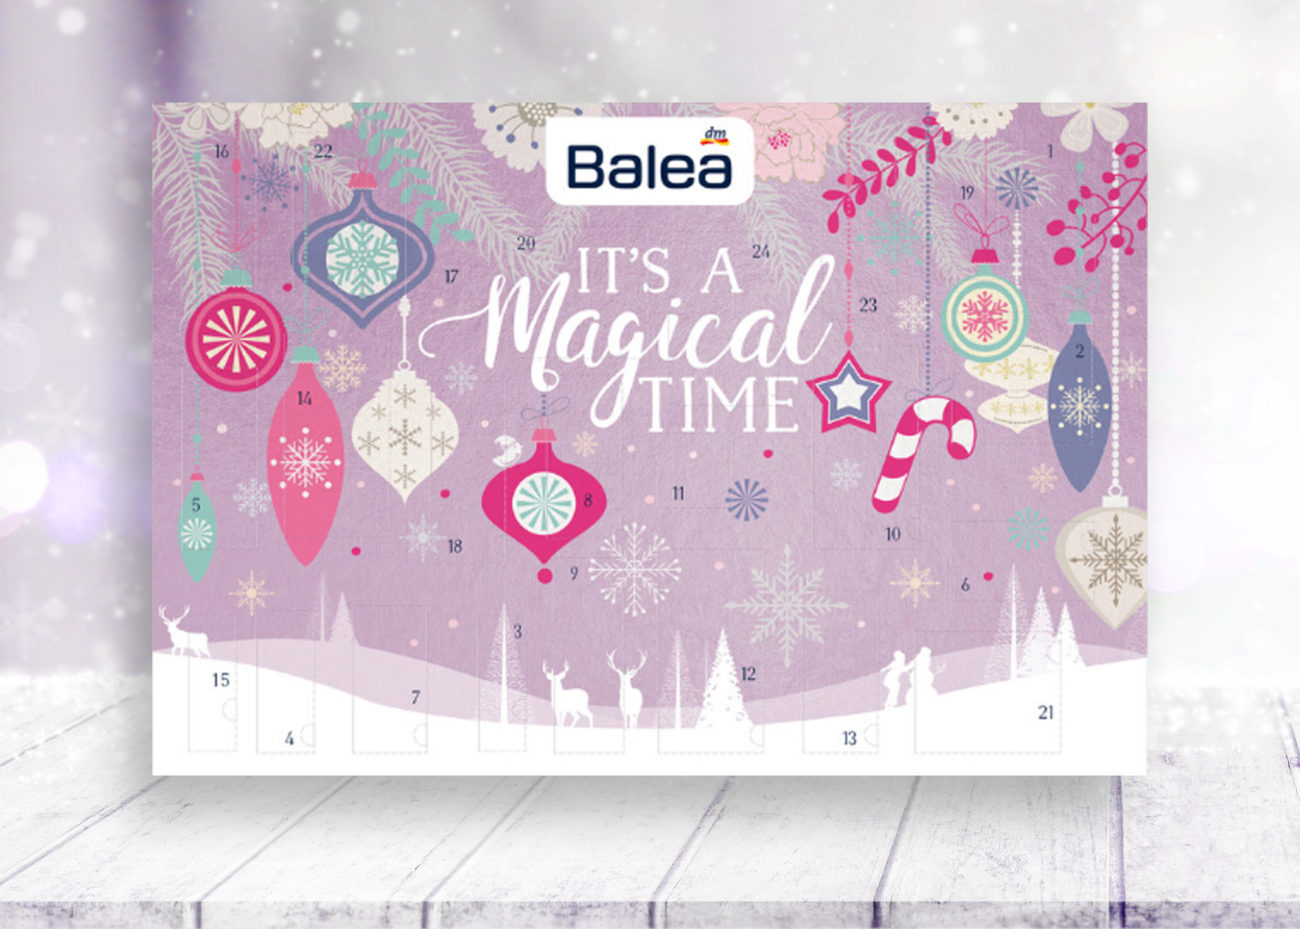 Balea Adventskalender 2019